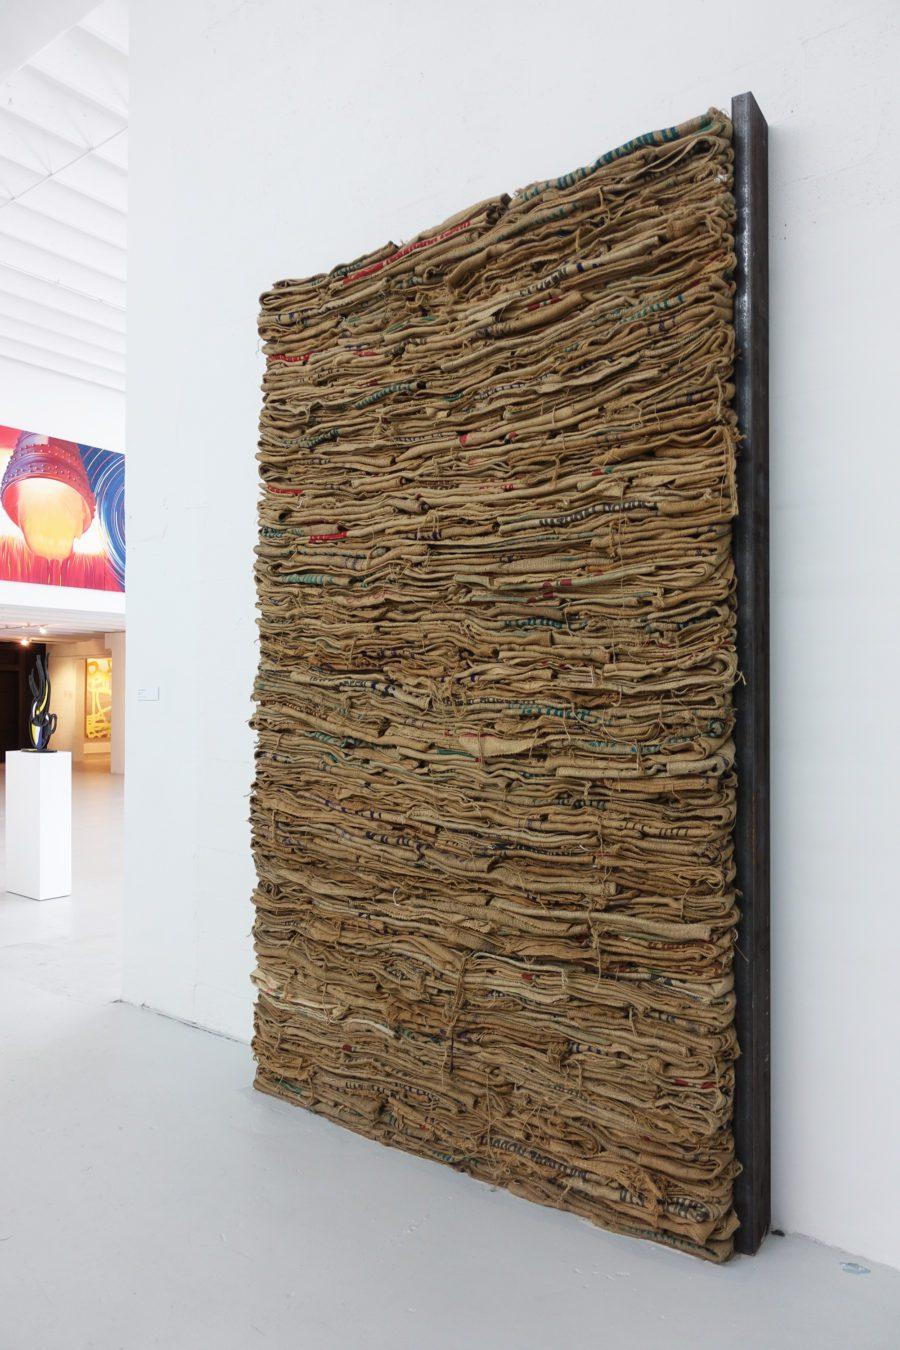 Jannis Kounellis at The Margulies Collection